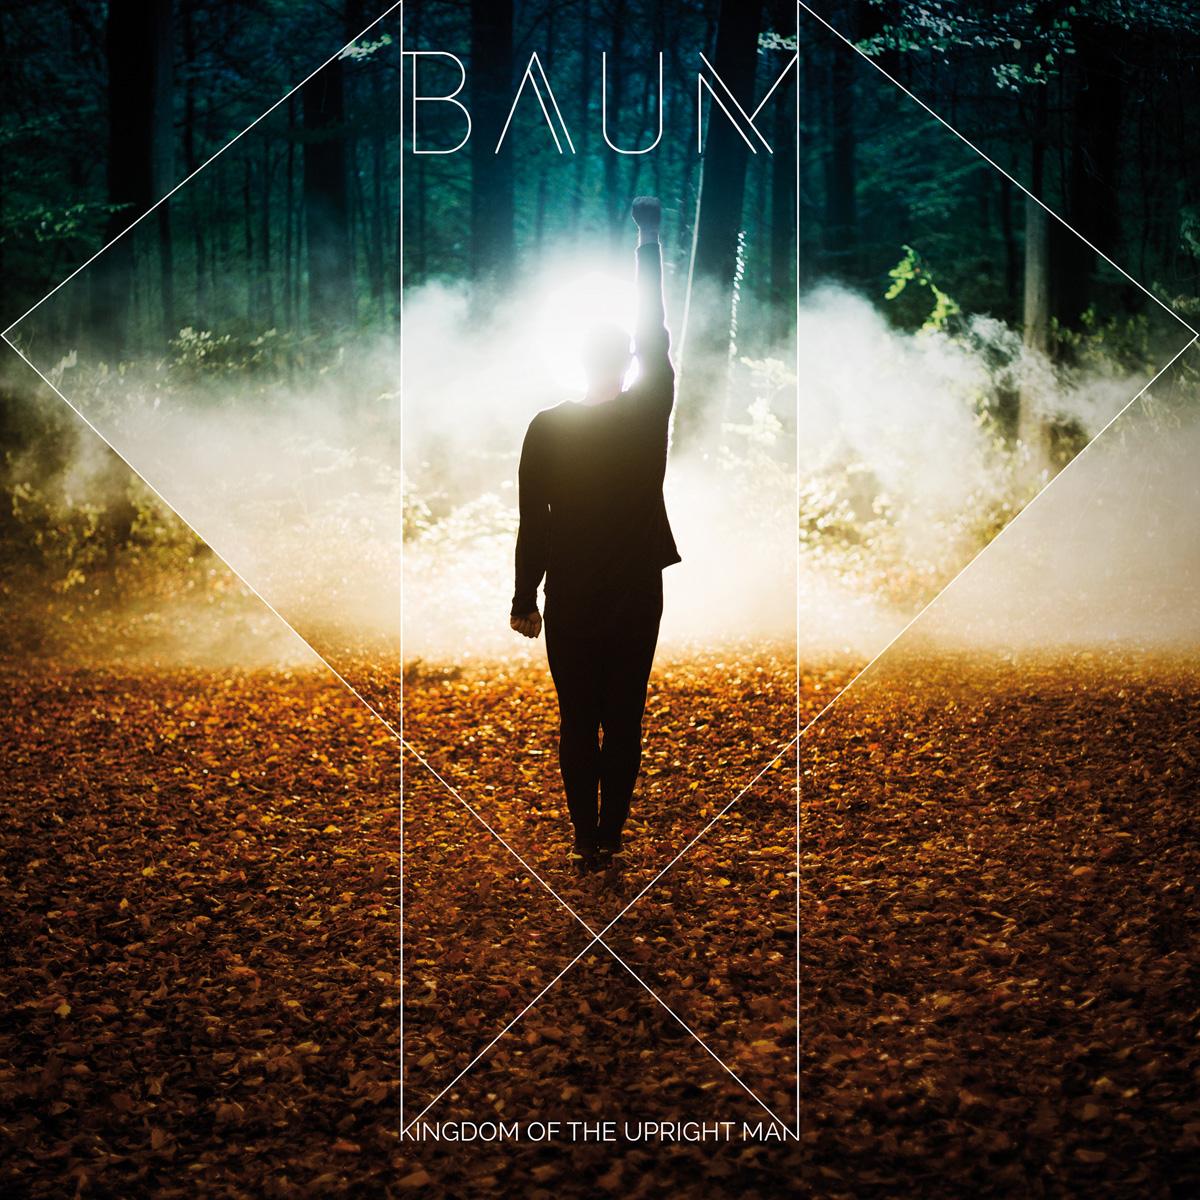 BAUM_Album+Cover_Kingdom+Of+The+Upright+Man_1200x1200px_sRGB.jpg